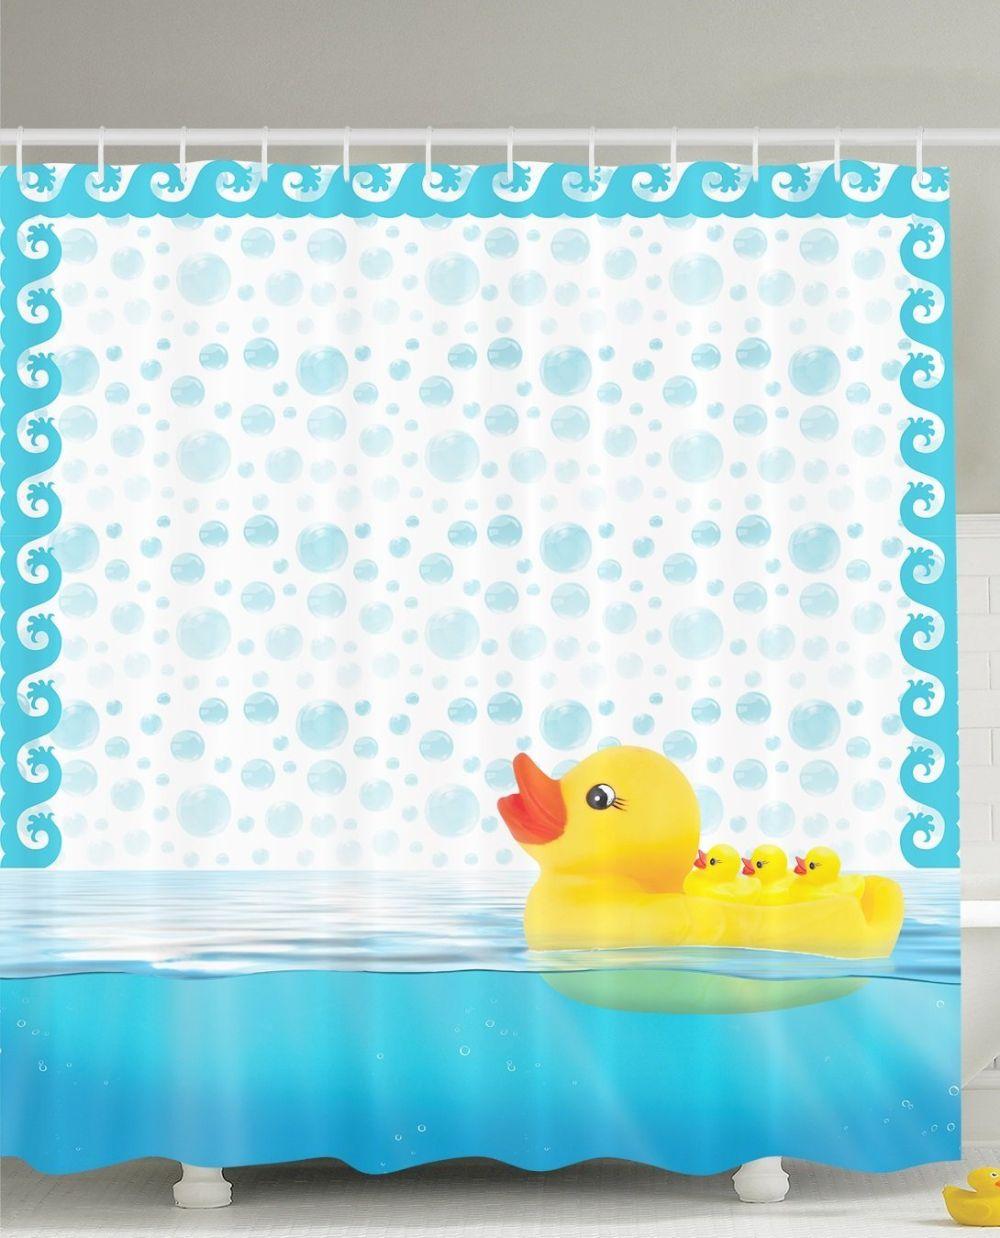 Nursery-Decor-Cute-Little-Rubber-Ducks-Shower-curtain